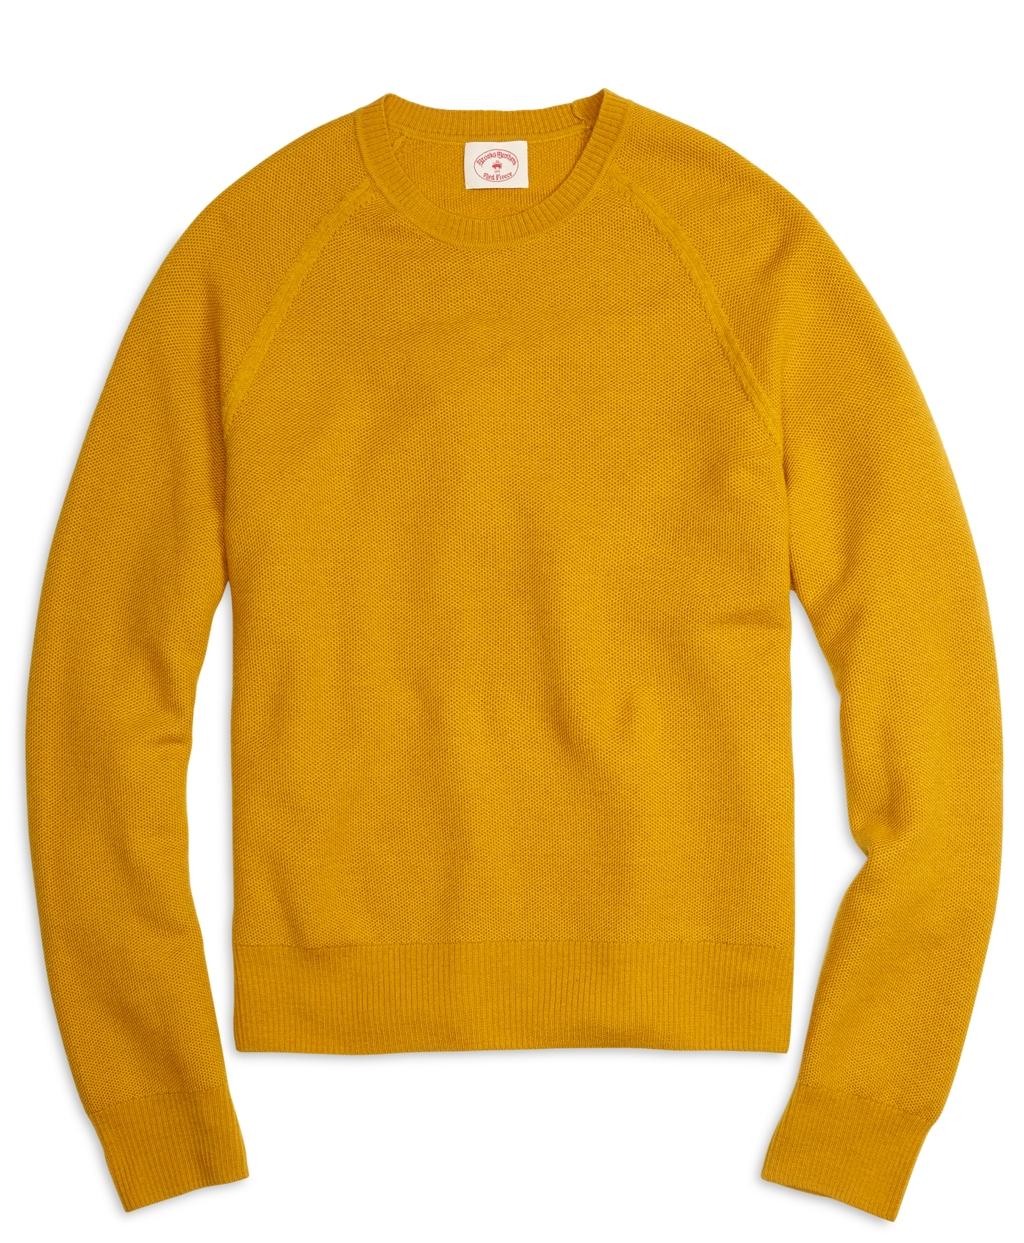 Brooks brothers Merino Wool Honeycomb Crewneck Sweater in Yellow ...